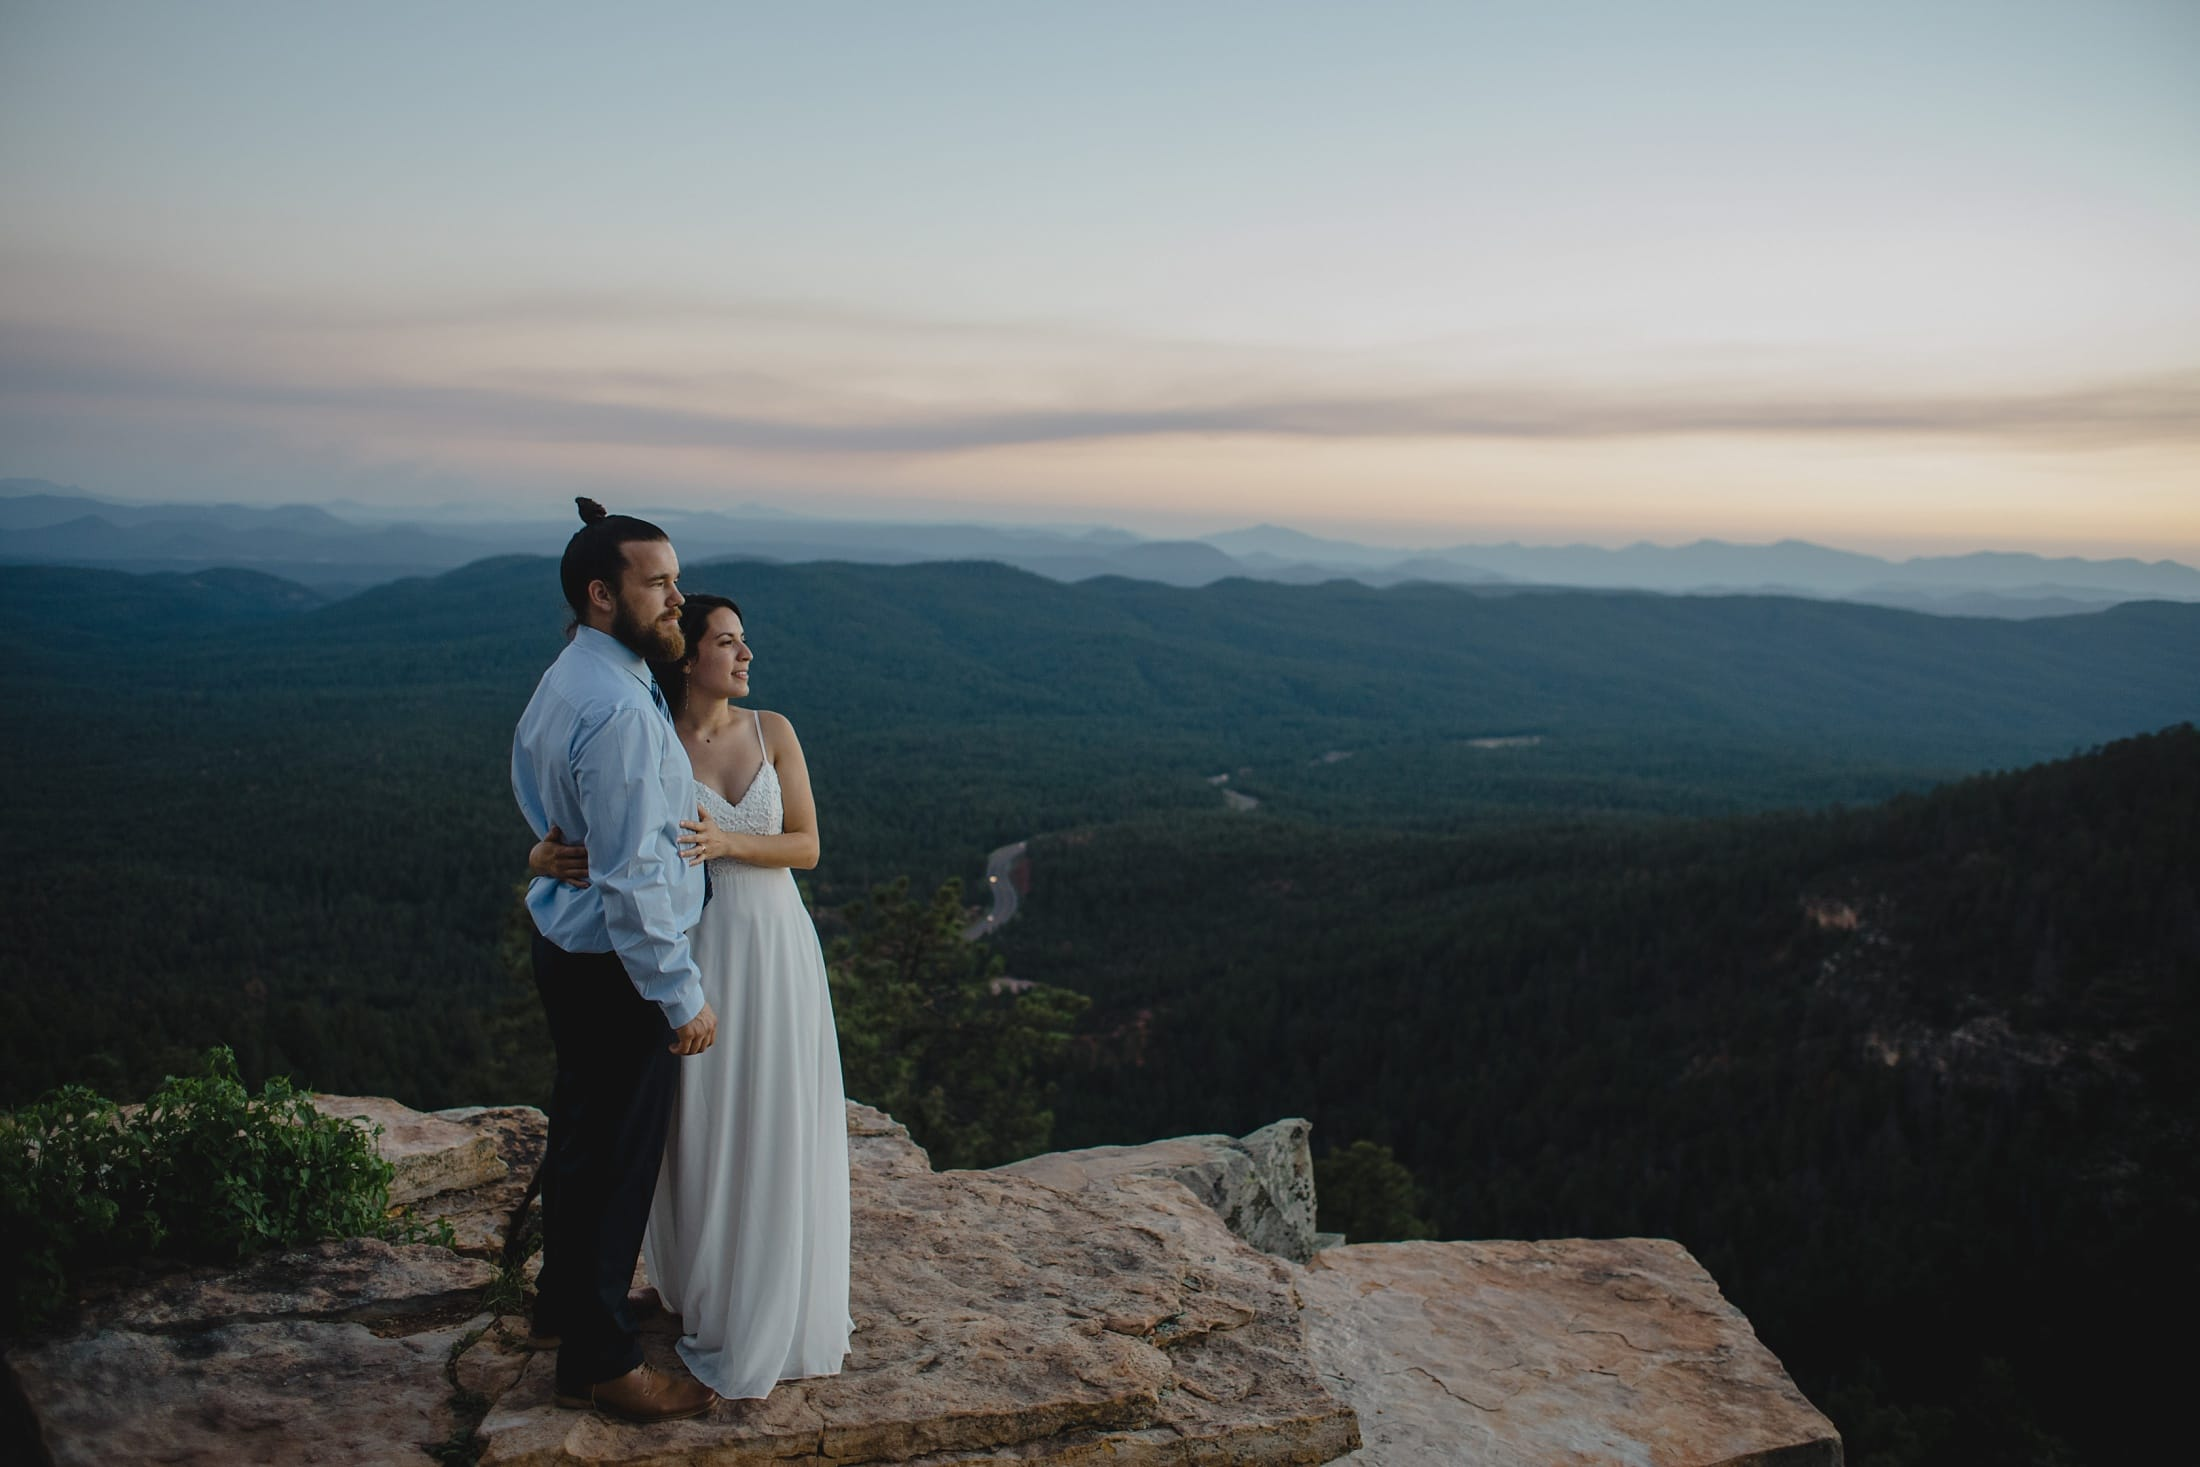 Mogollon Rim elopement at sunset